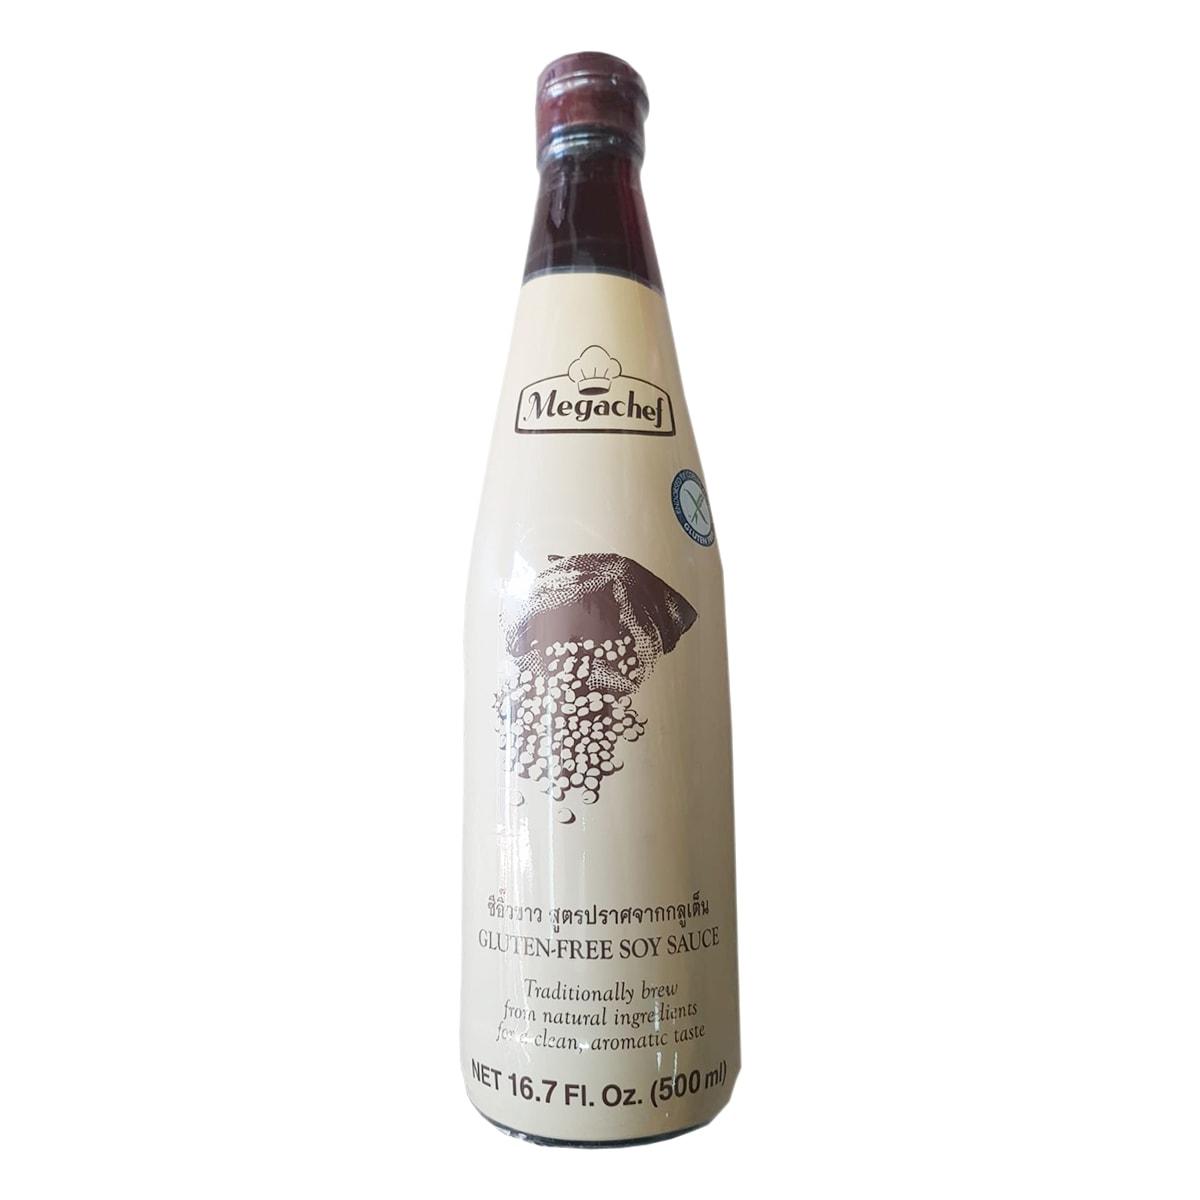 Buy Megachef Gluten-free Soy Sauce - 500 ml